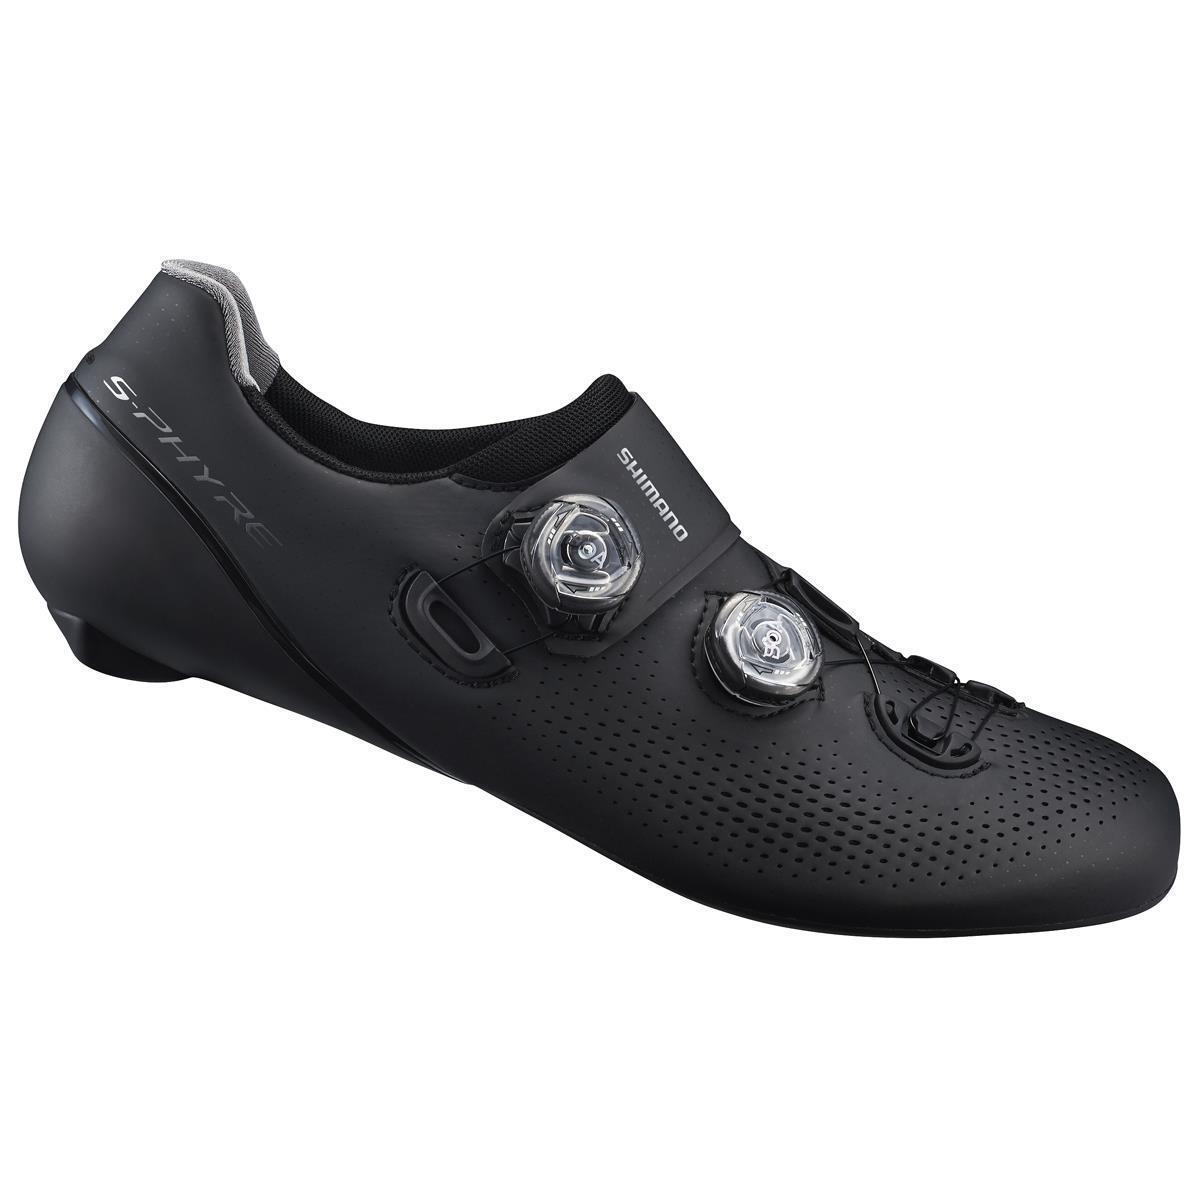 Road zapatos S-PHYRE RC9 SH-RC901SB1 negro 2019 SHIMANO cycling zapatos